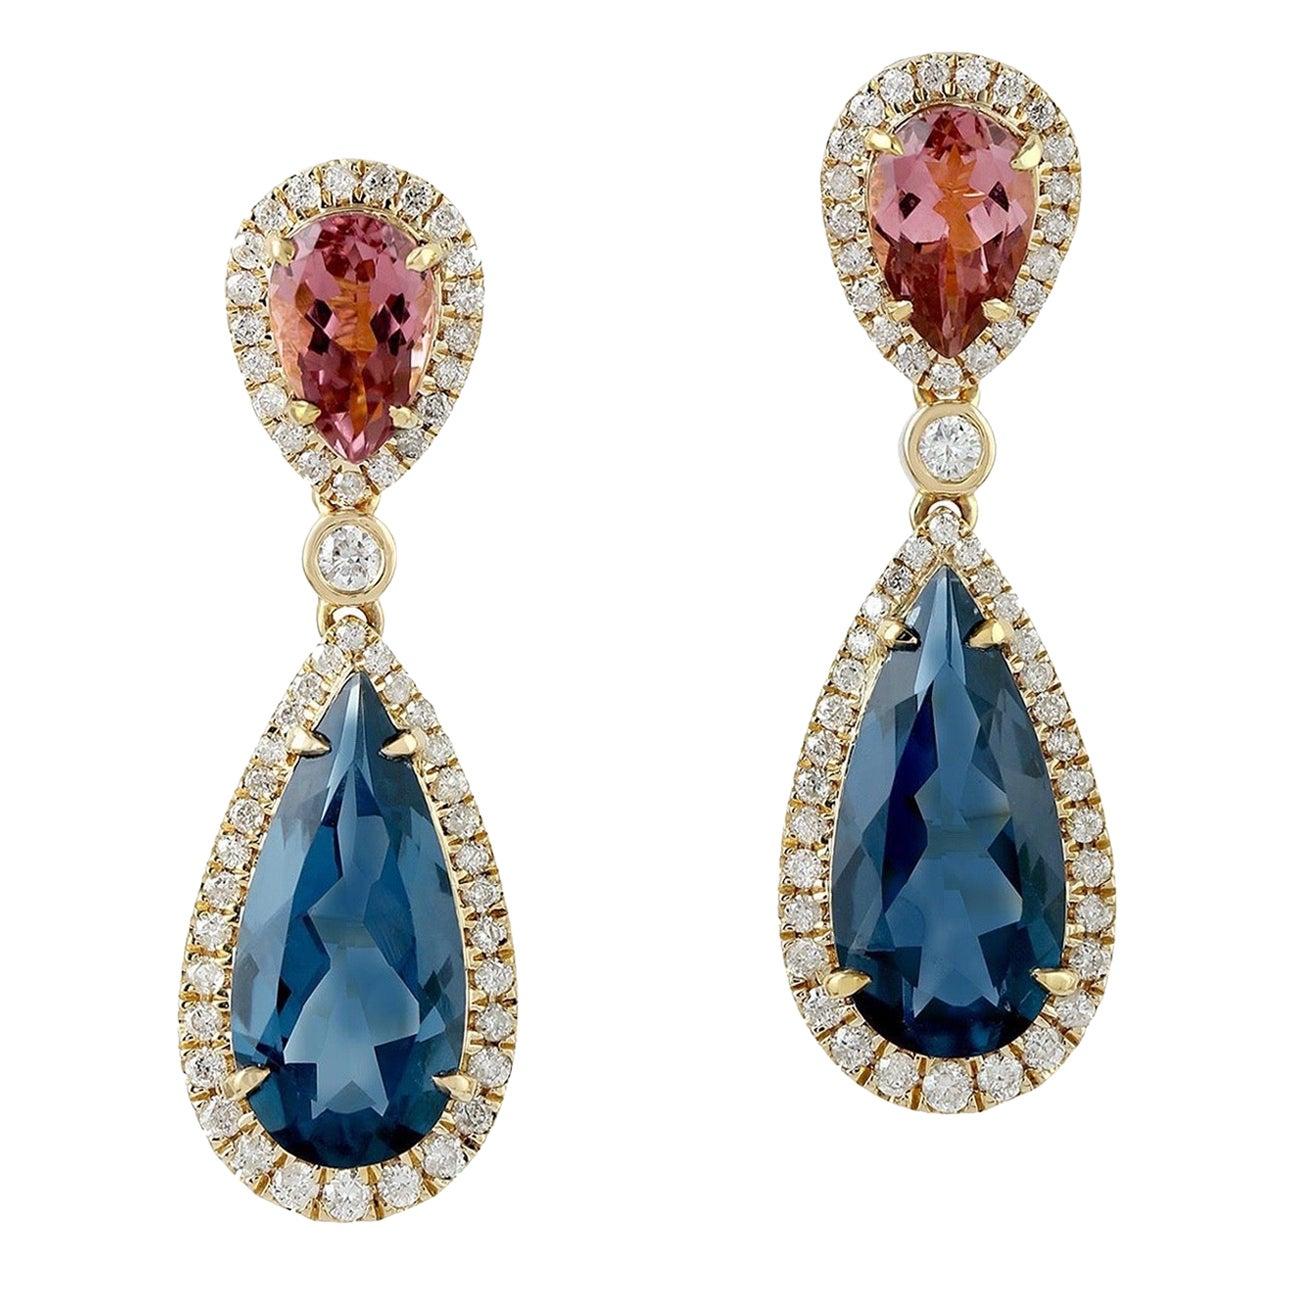 18 Karat Gold Tourmaline Diamond Earrings